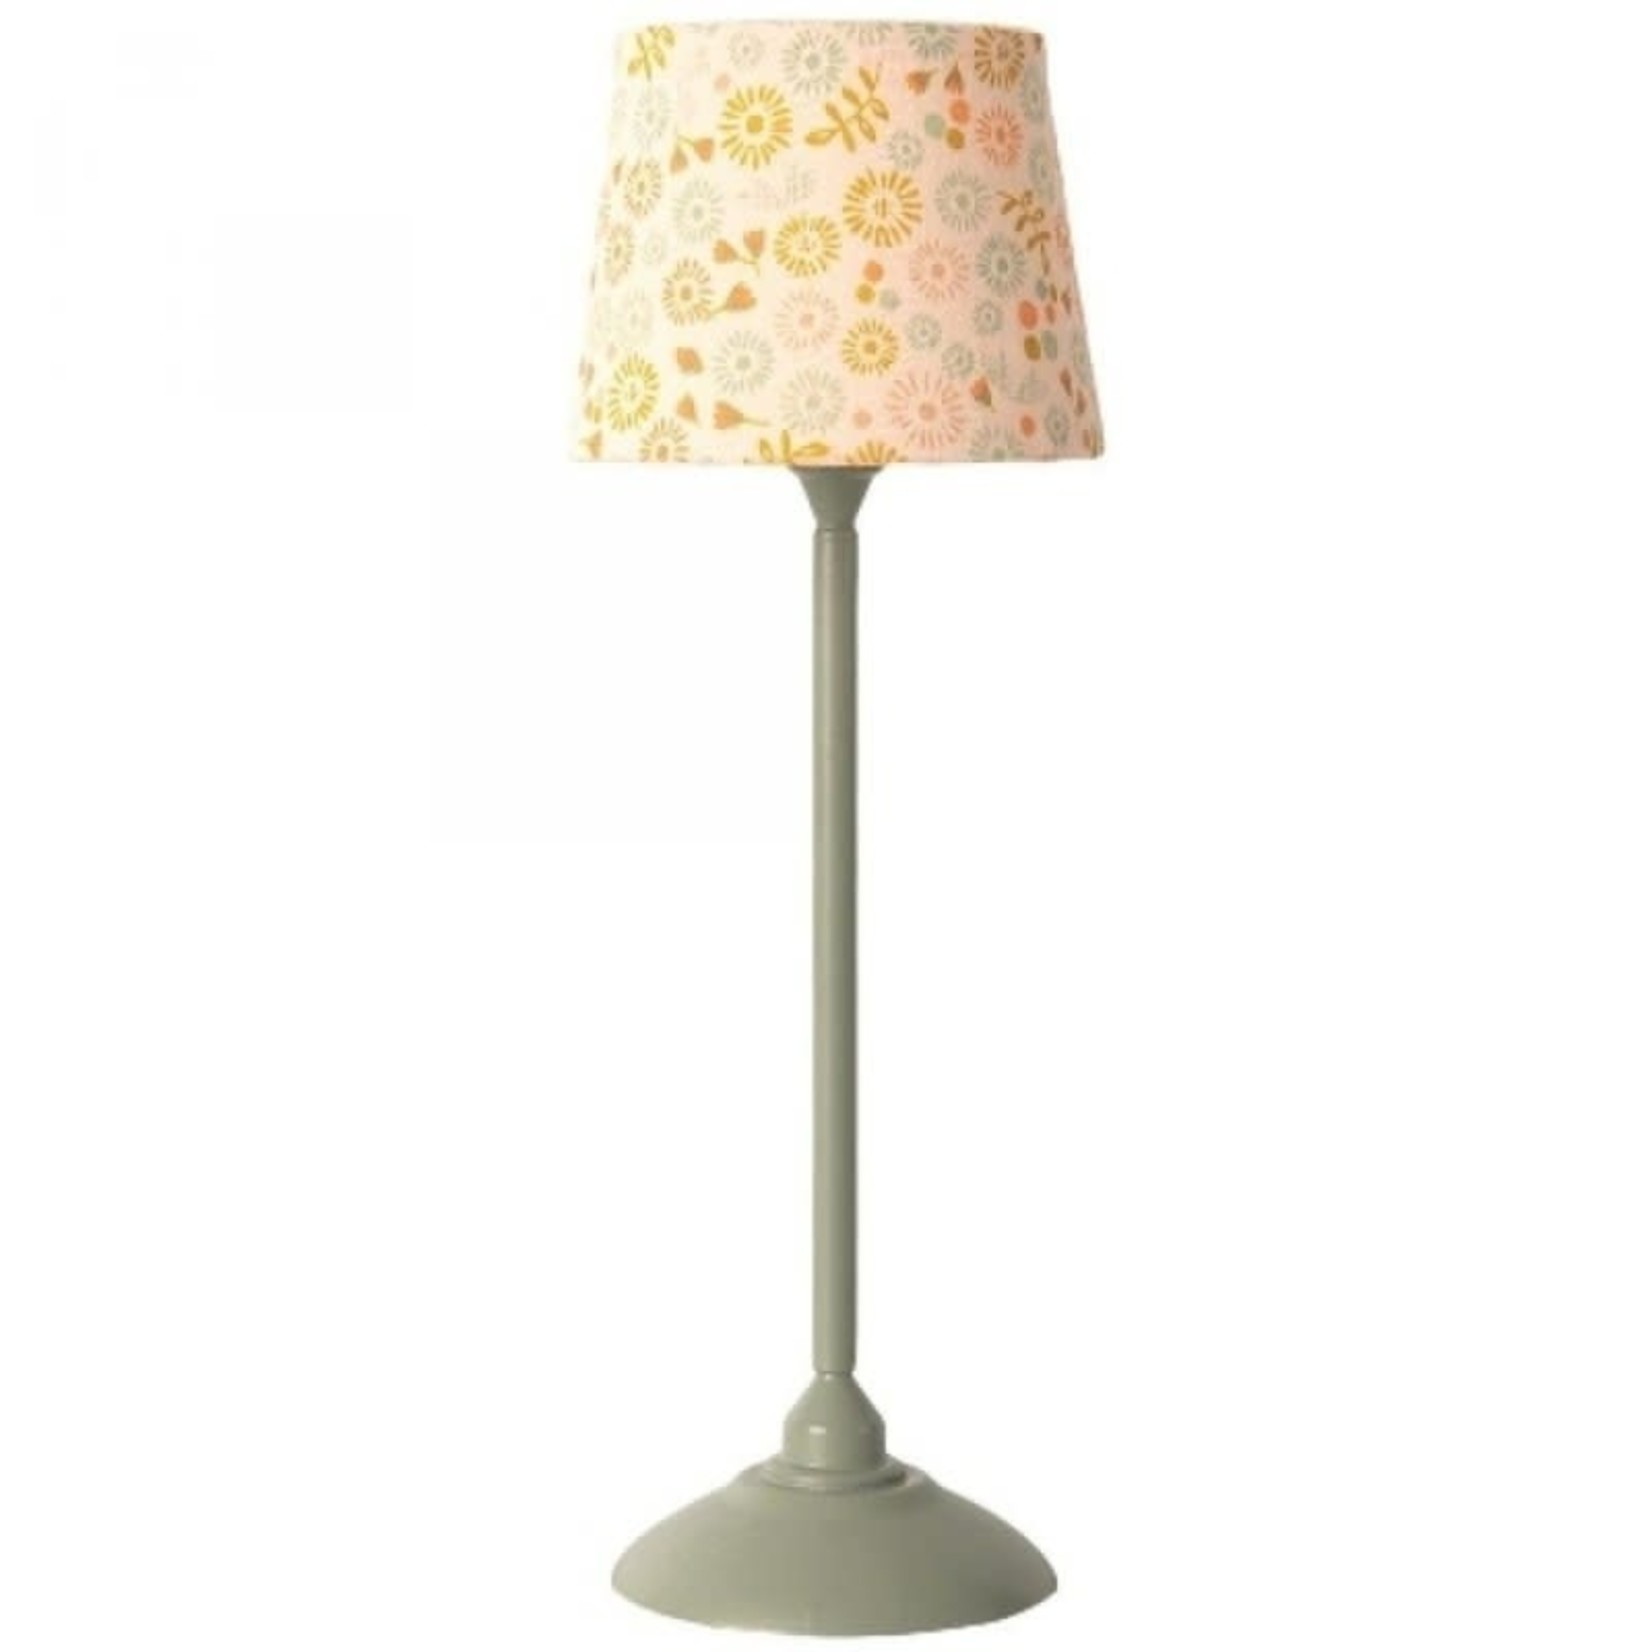 Maileg Floor Lamp - Maileg